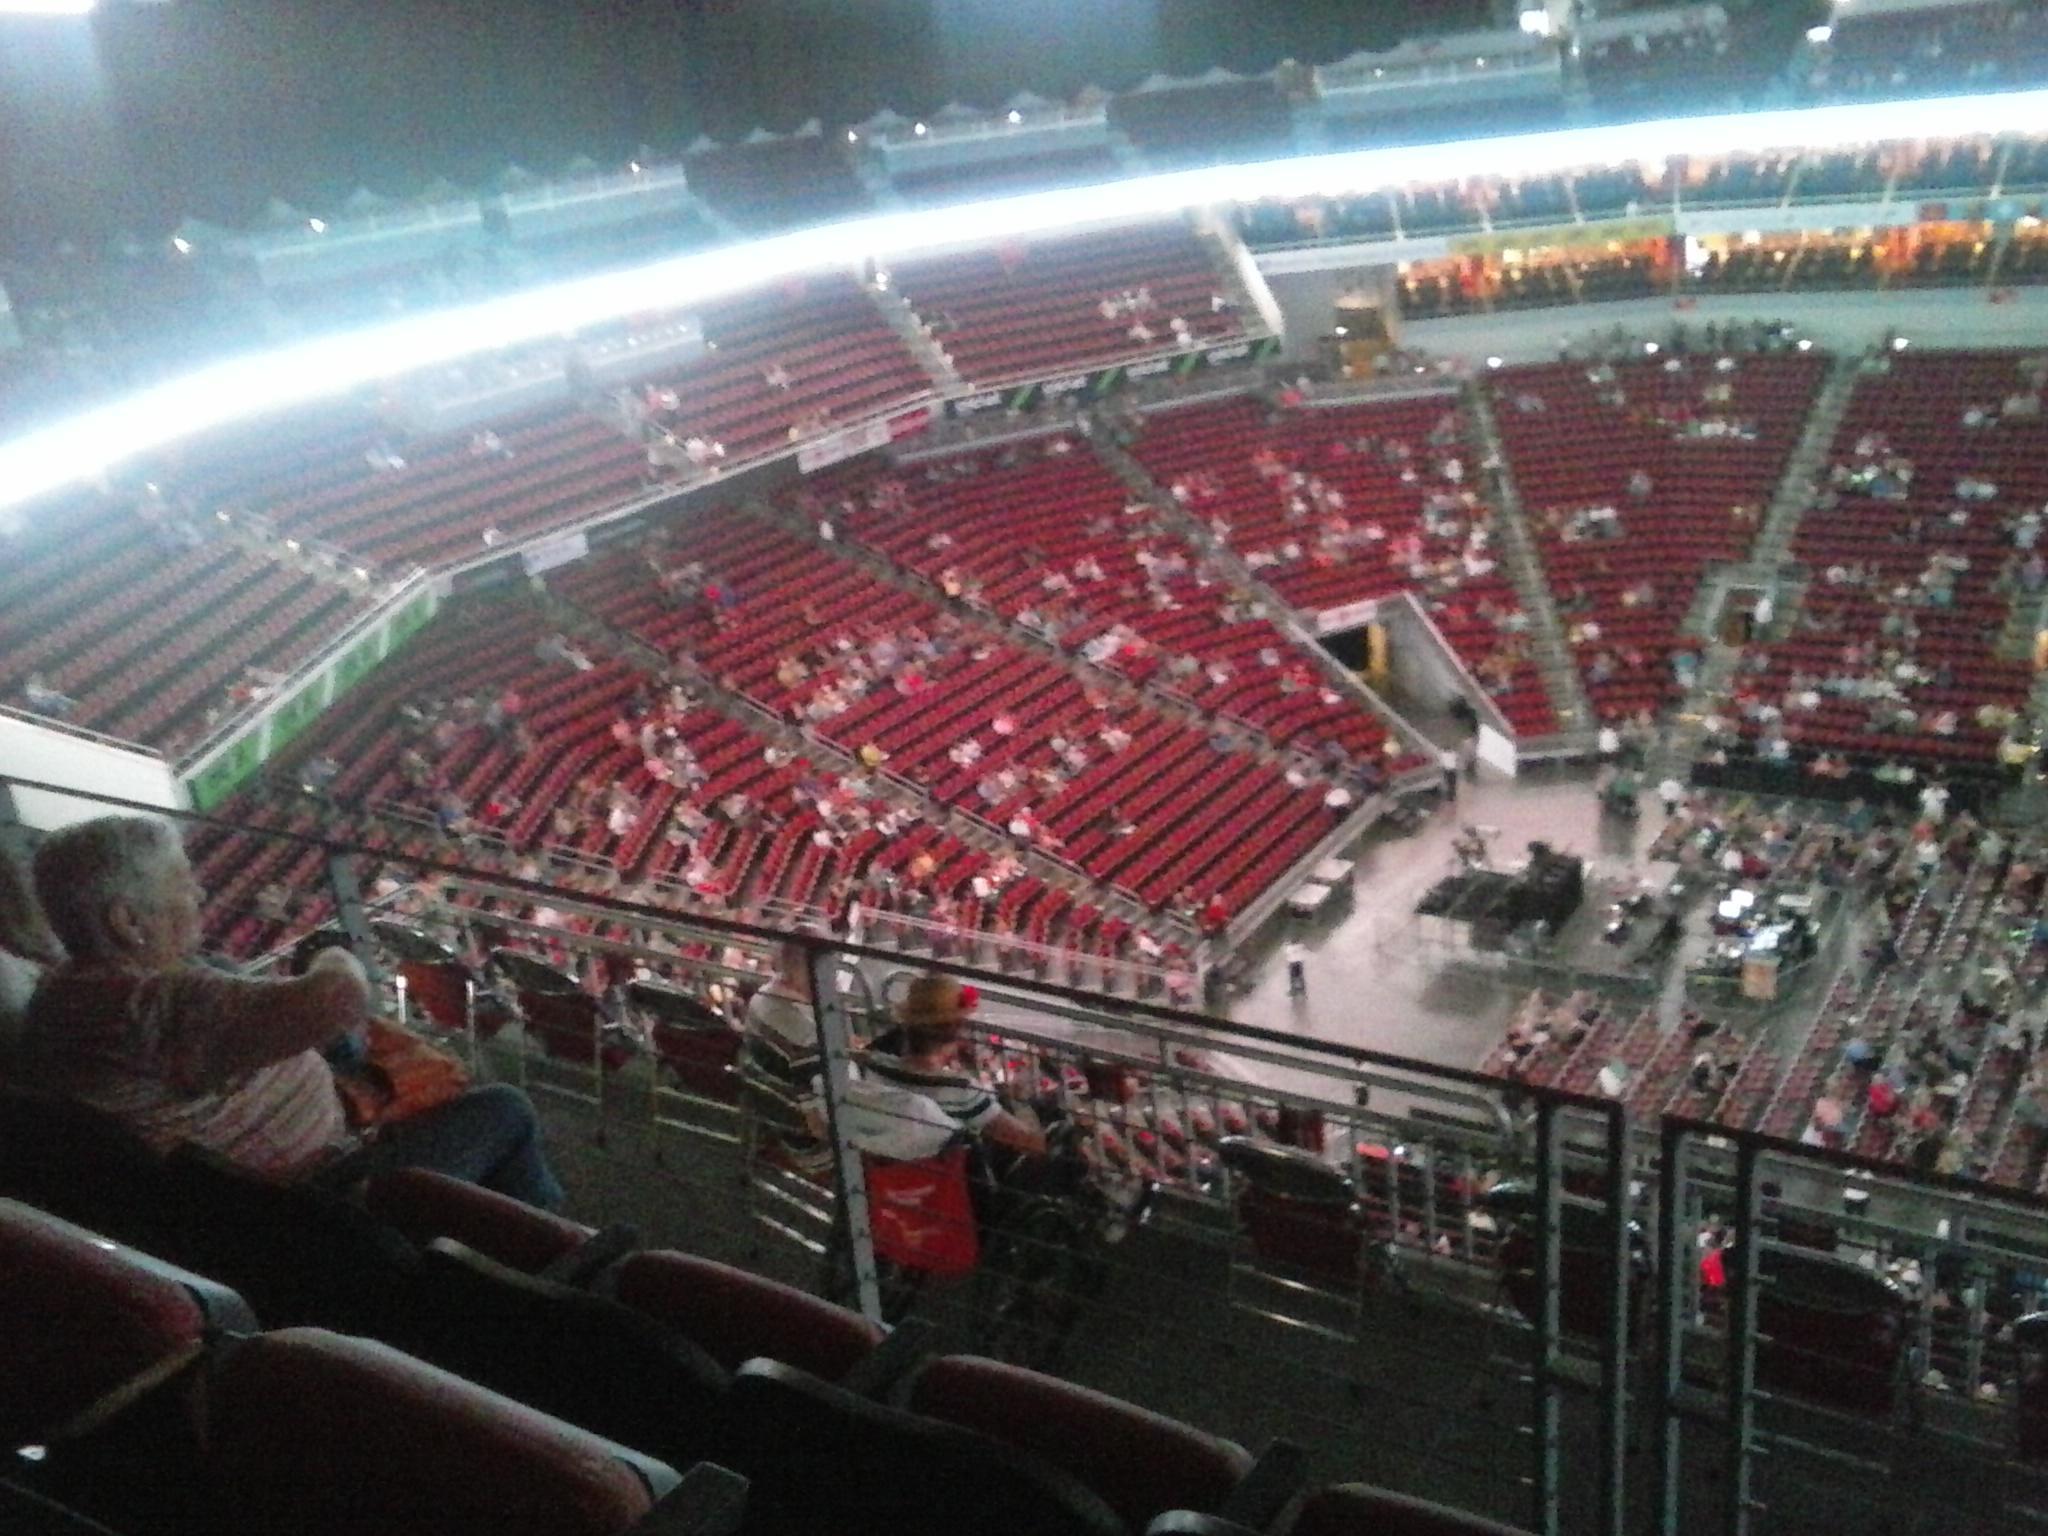 KFC Yum! Center Section 308 Row J Seat 11